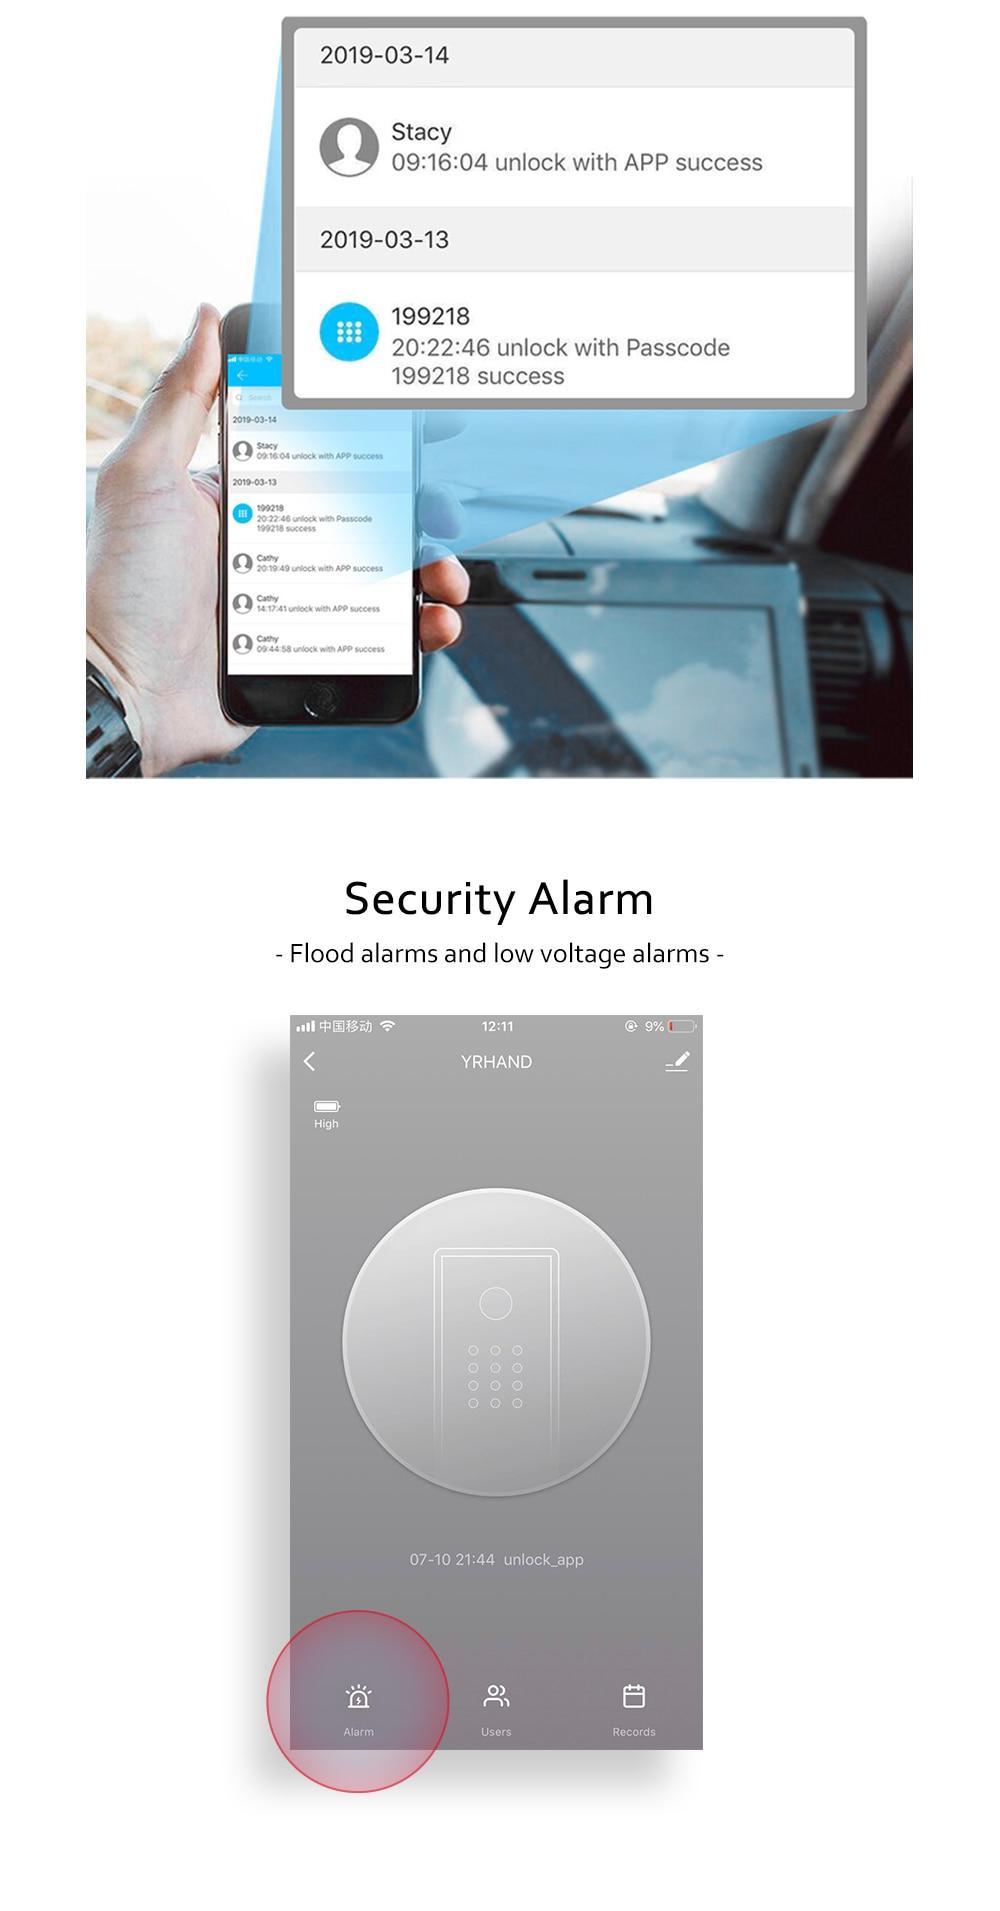 H241ccd29c249493aa02e3d4a13ca7358f WIFI Smart Fingerprint Door Lock Code Card Key Touch Screen Digital Password Lock Electronic Door Lock with Tuya Smart APP